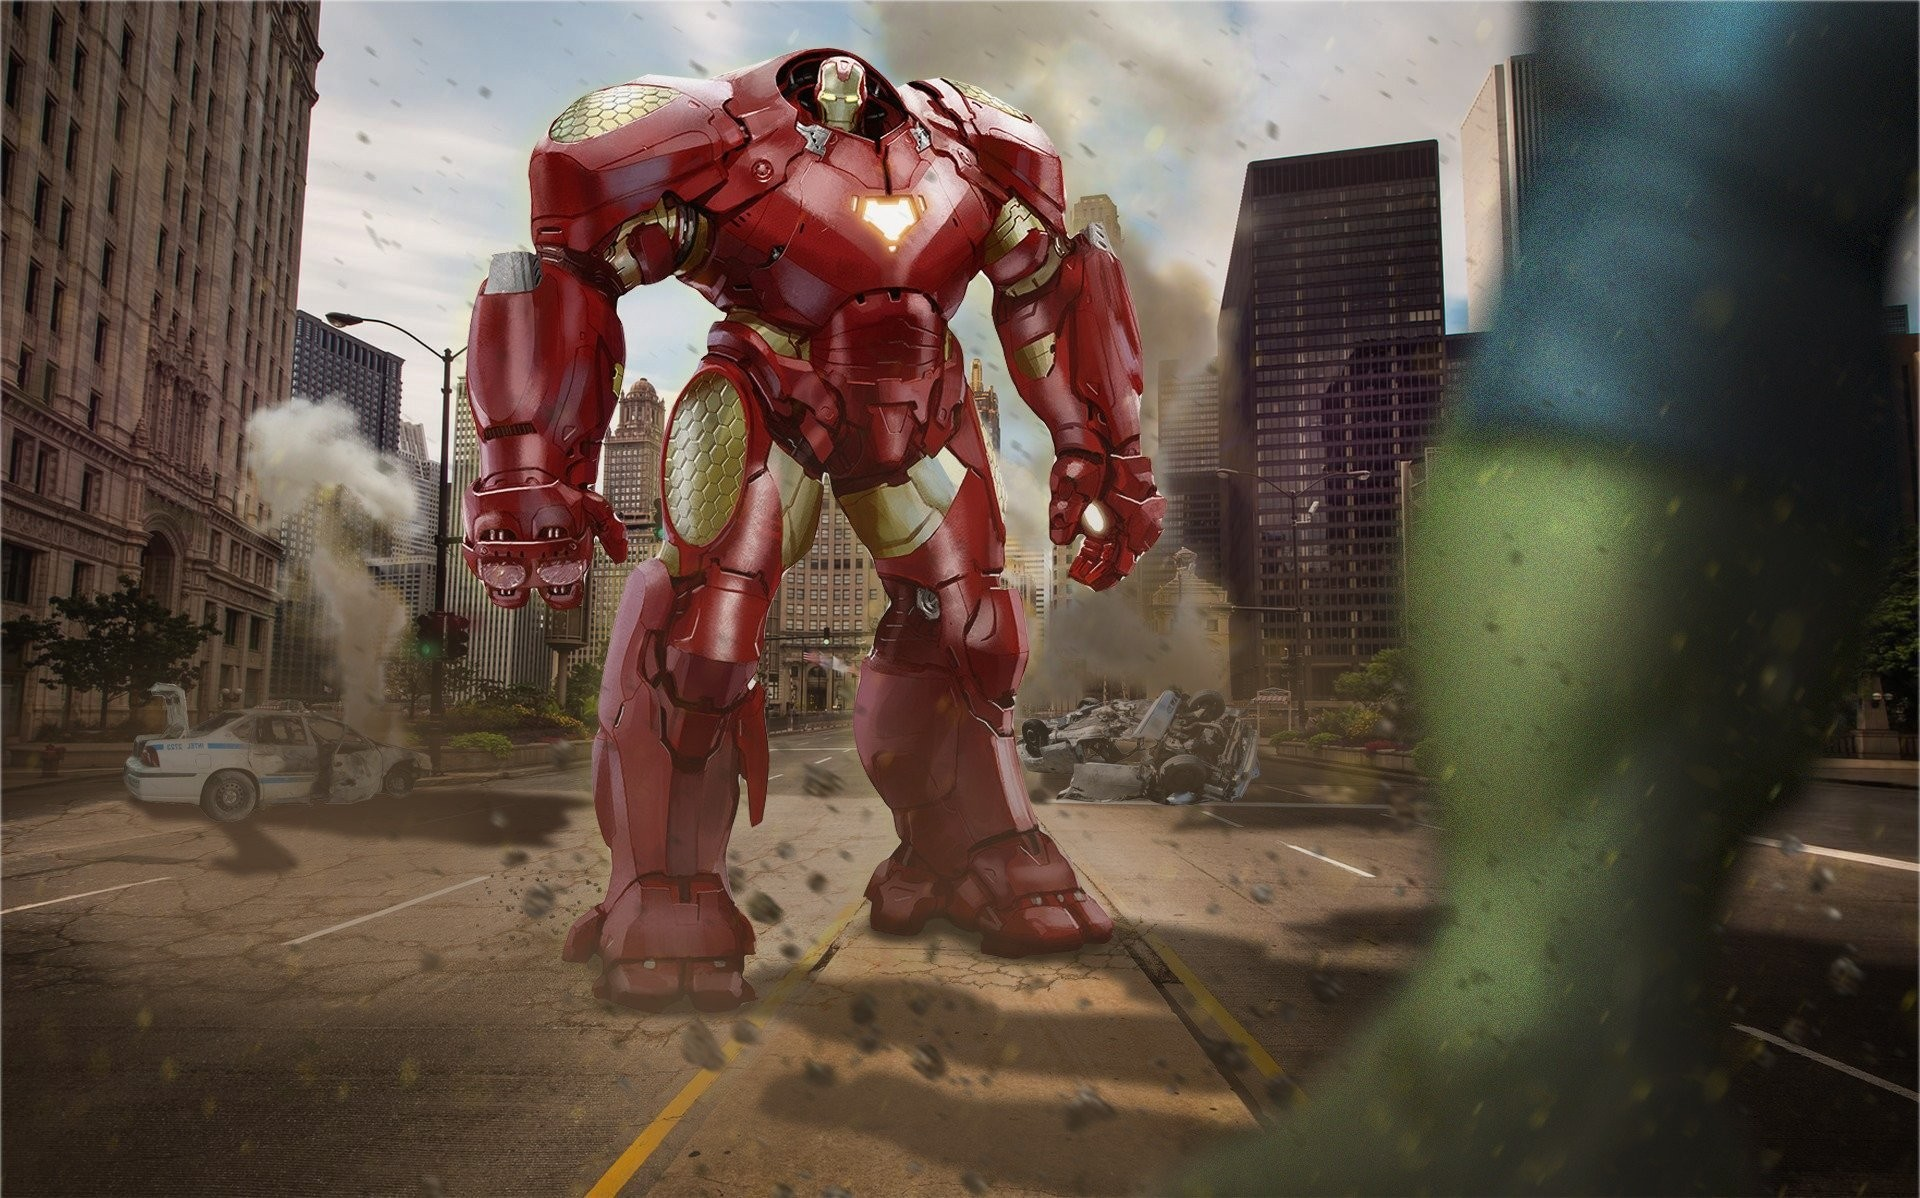 avengers iron man armor hulk art avengers: age of ultron hulkbuster